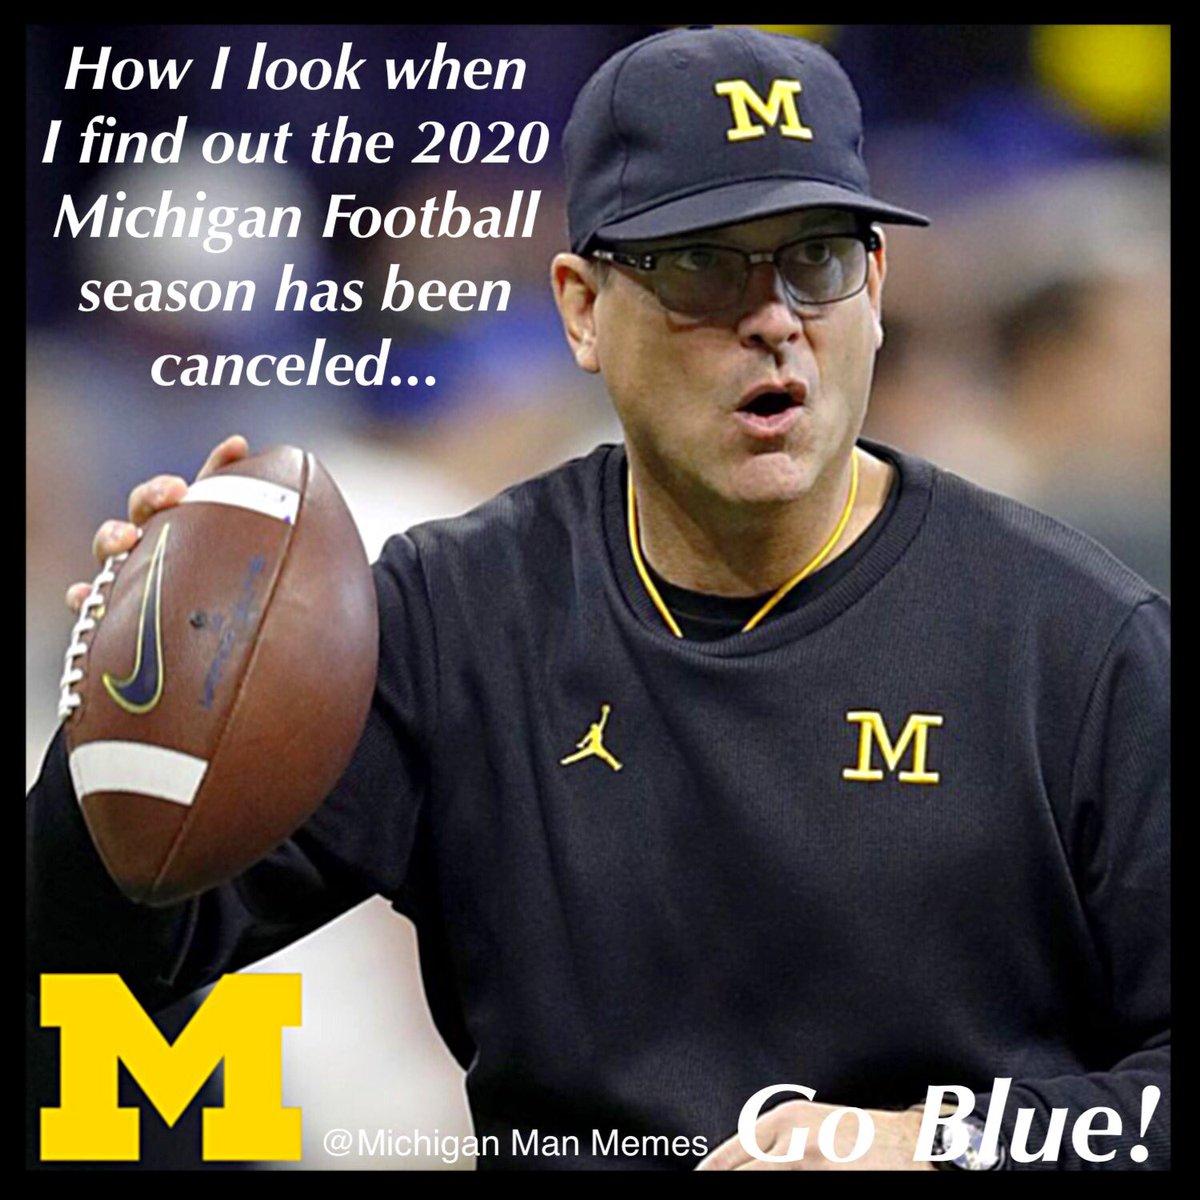 Michiganmanmemes Umichmanmemes Twitter